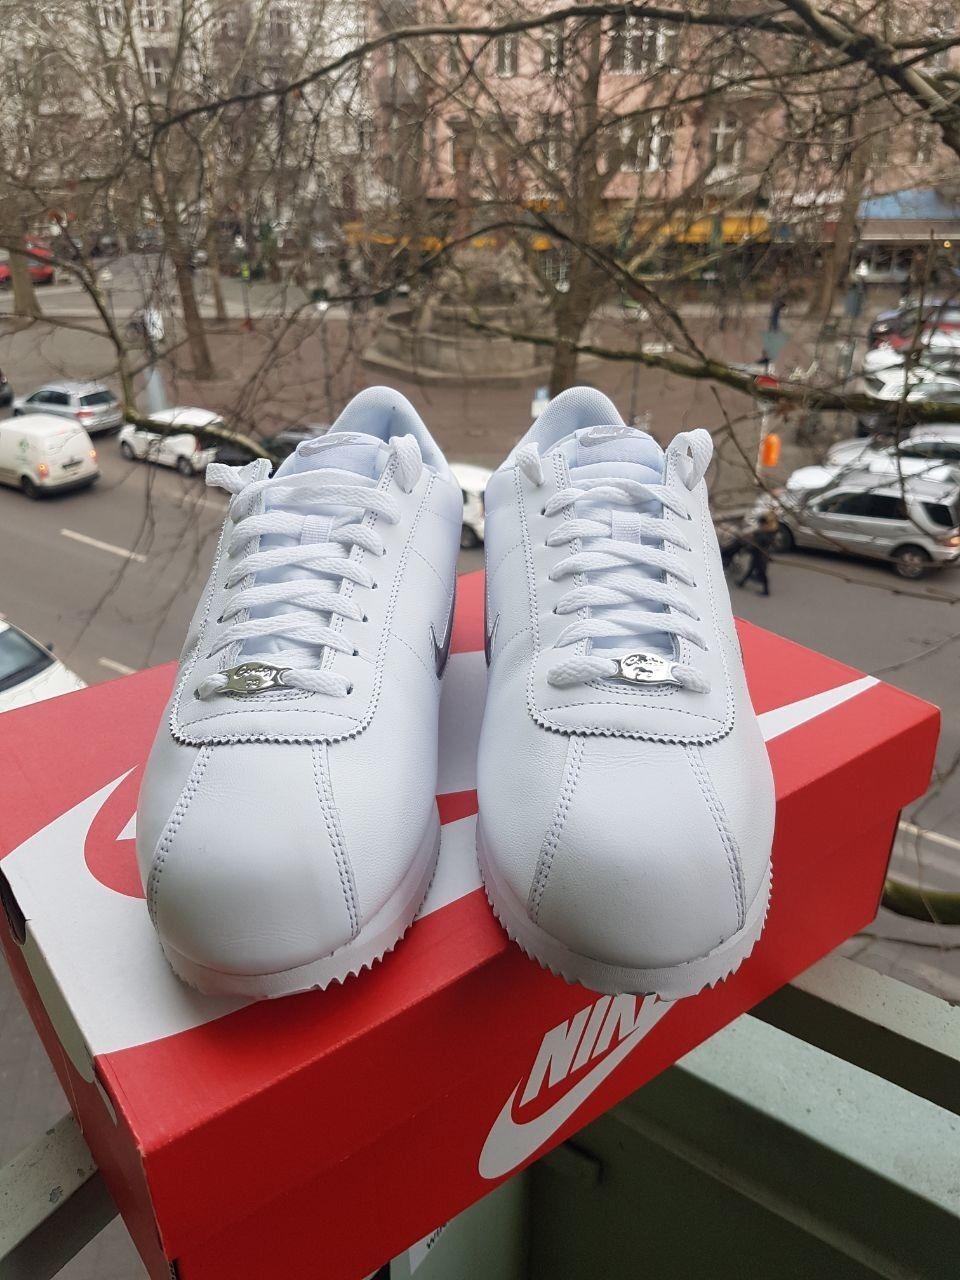 NIKE CORTEZ BASIC JEWEL Sneaker Herren Herrenschuhe Turnschuhe Weiss 833238-101